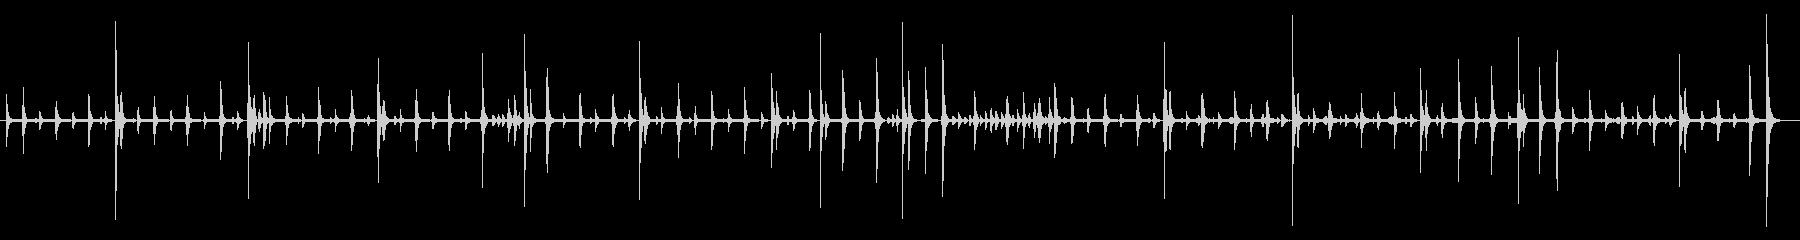 JAZZ RHYTHM、BRUSH...の未再生の波形